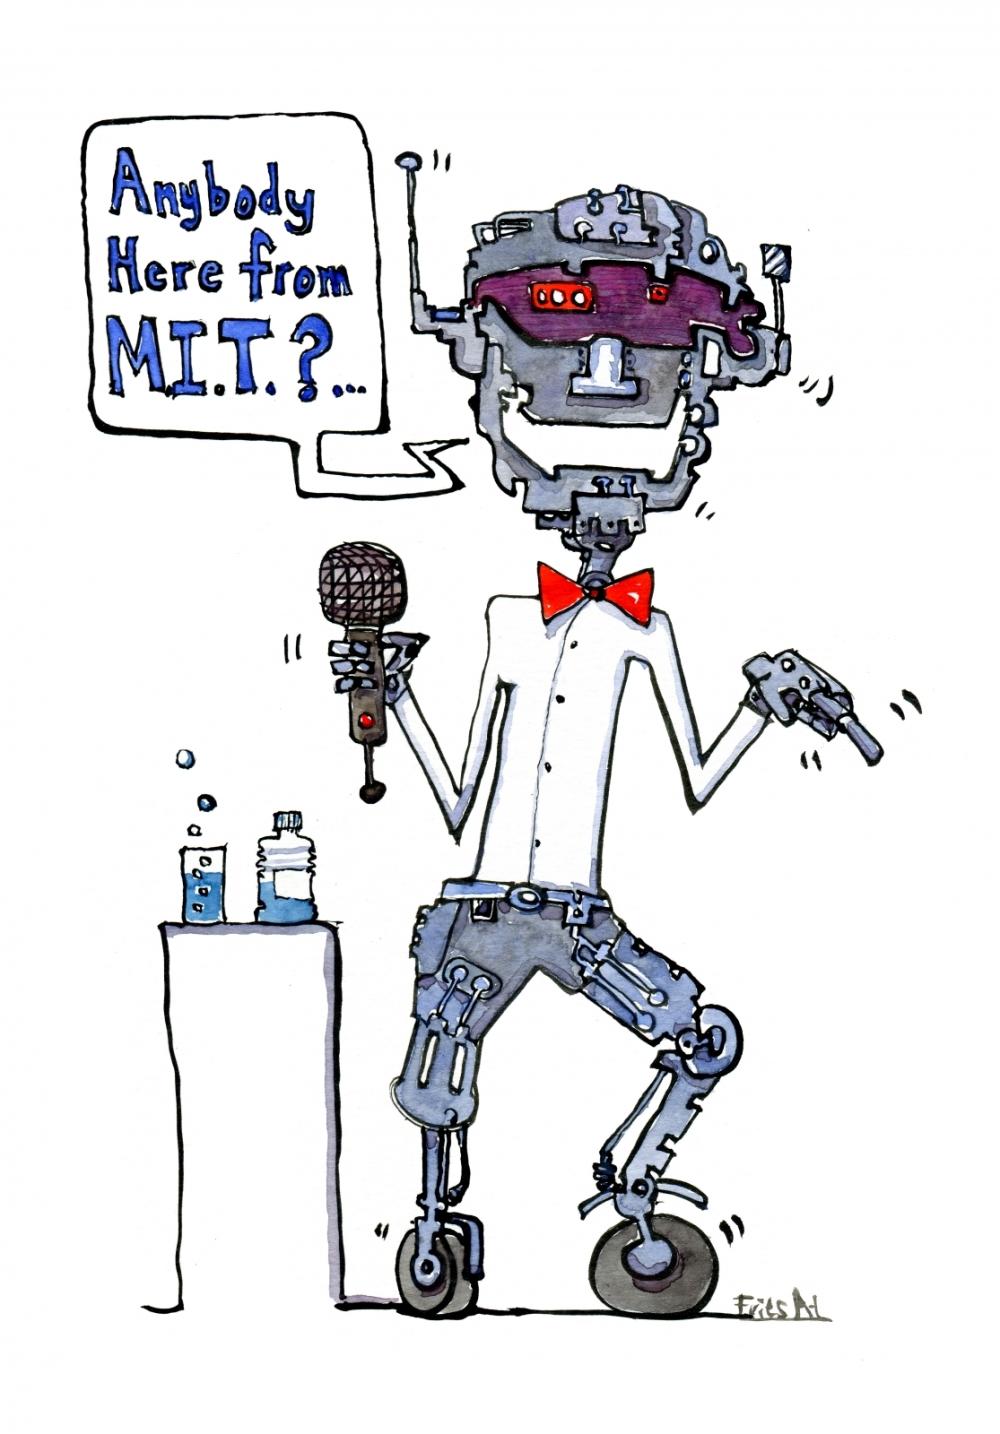 Droid robot, making a stand up joke